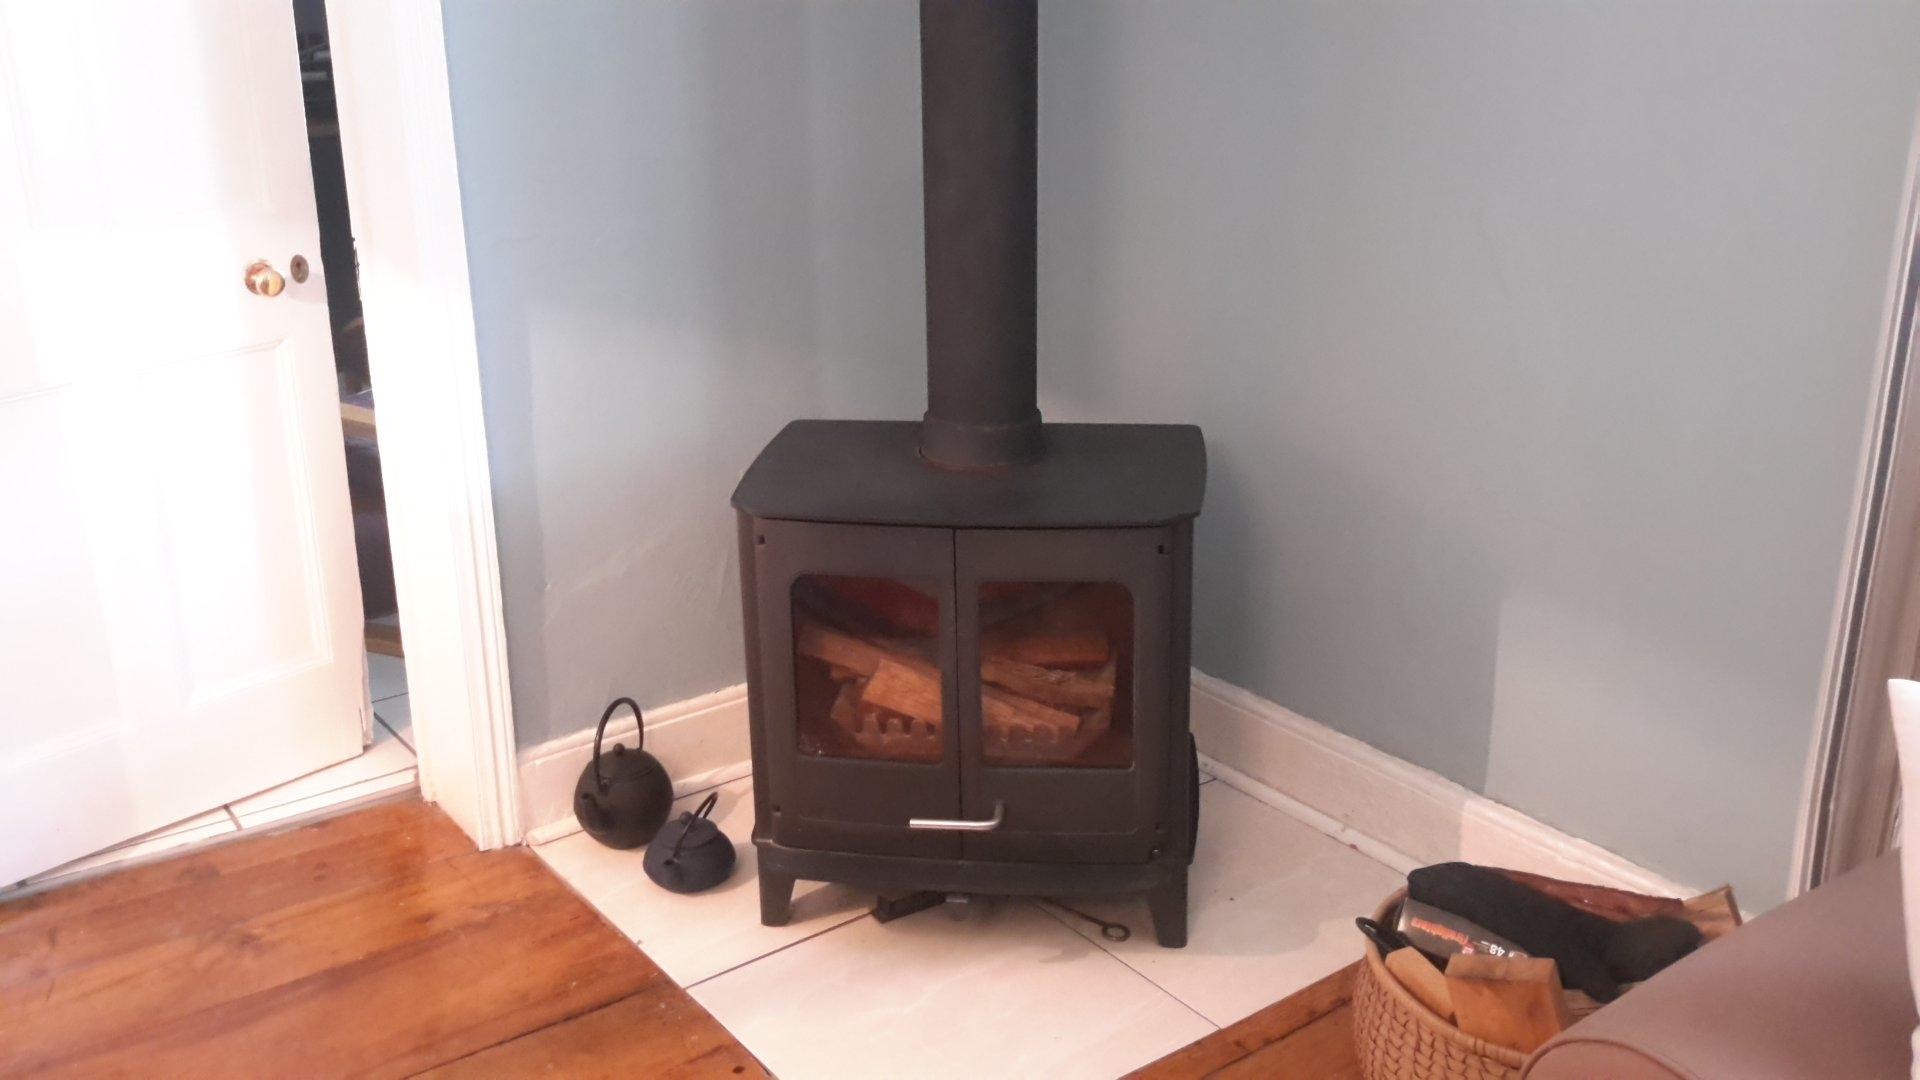 Morso wood burning fireplace in living room